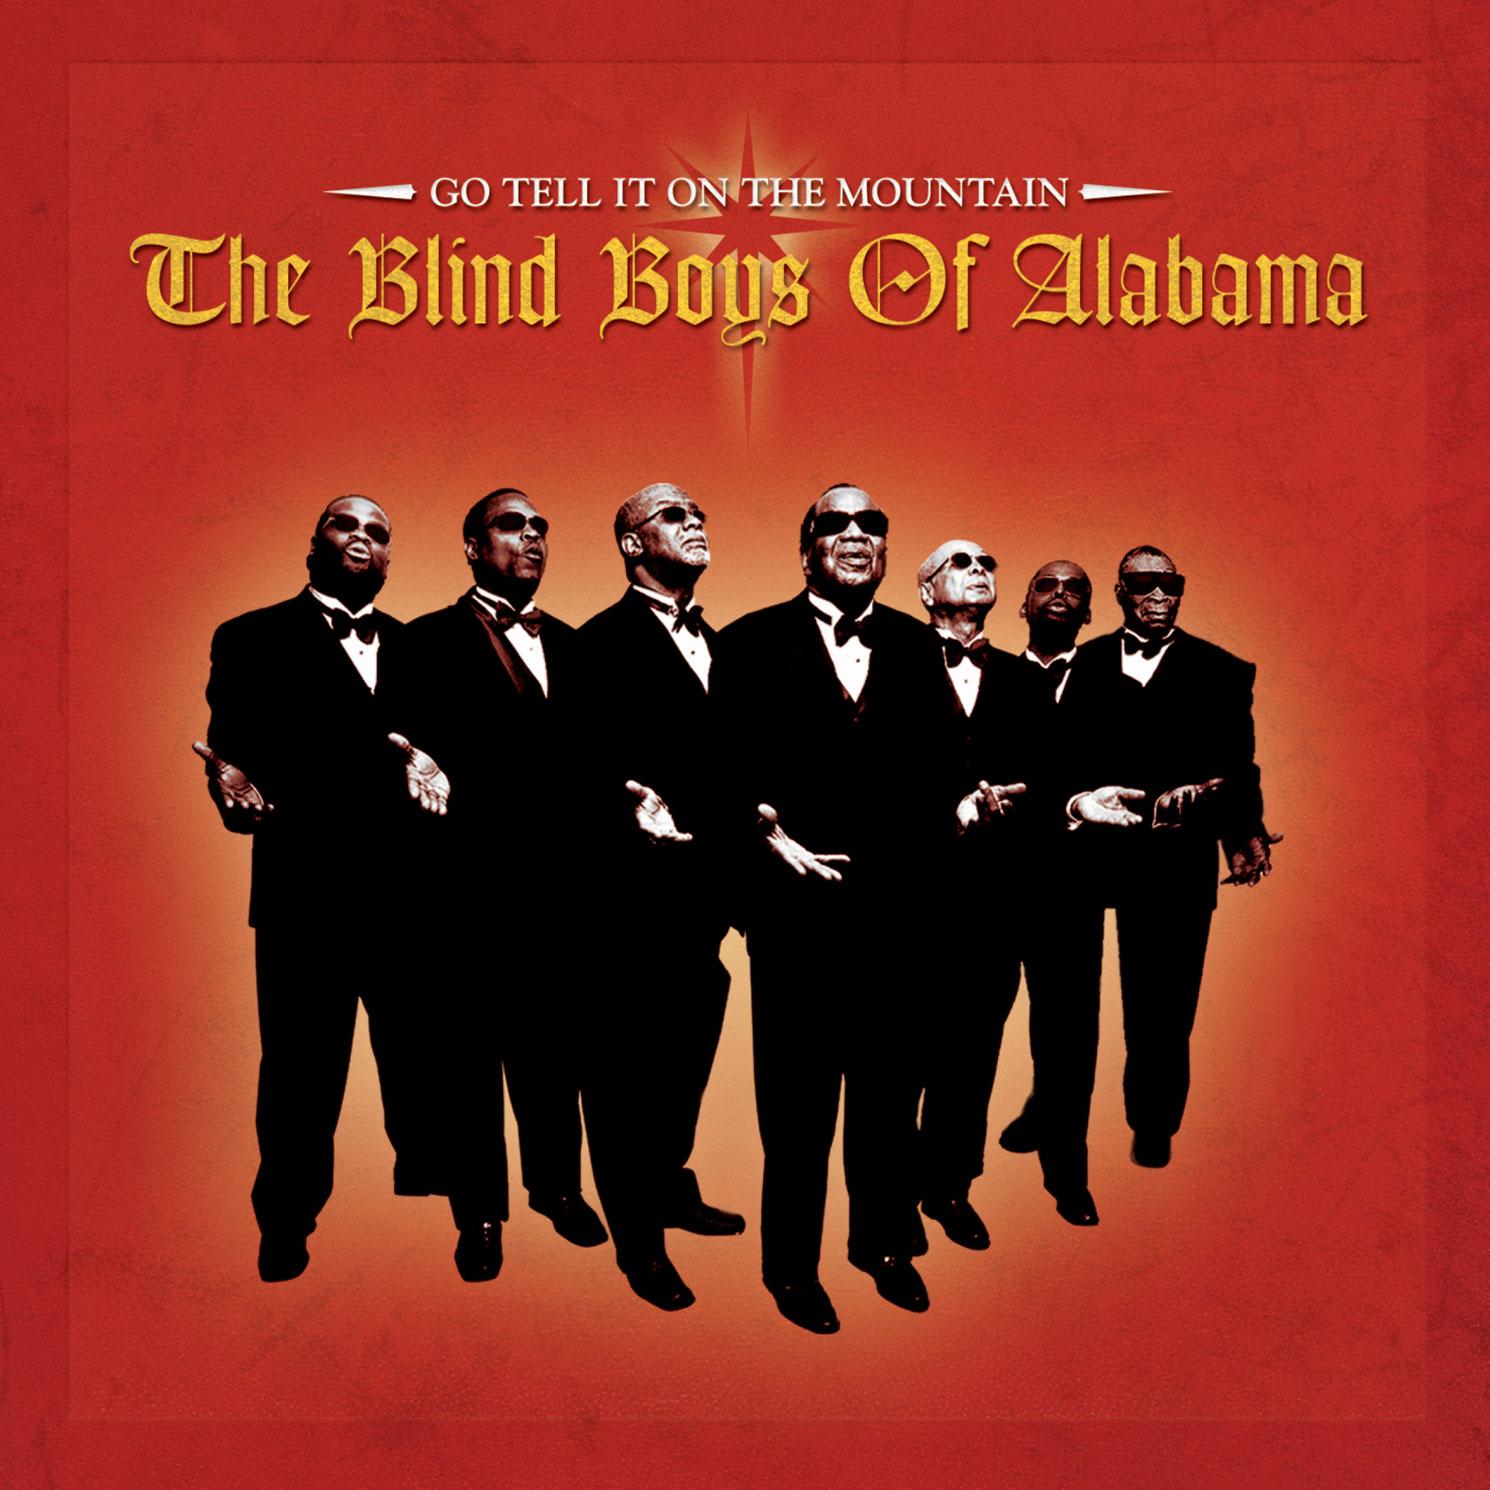 The Blind Boys of Alabama-Go Tell It On The Mountain  Release Date: November 4, 2016 Label: Omnivore Recordings  SERVICE: Restoration, Mastering (Bonus tracks) NUMBER OF DISCS: 1 GENRE: Gospel FORMAT: CD